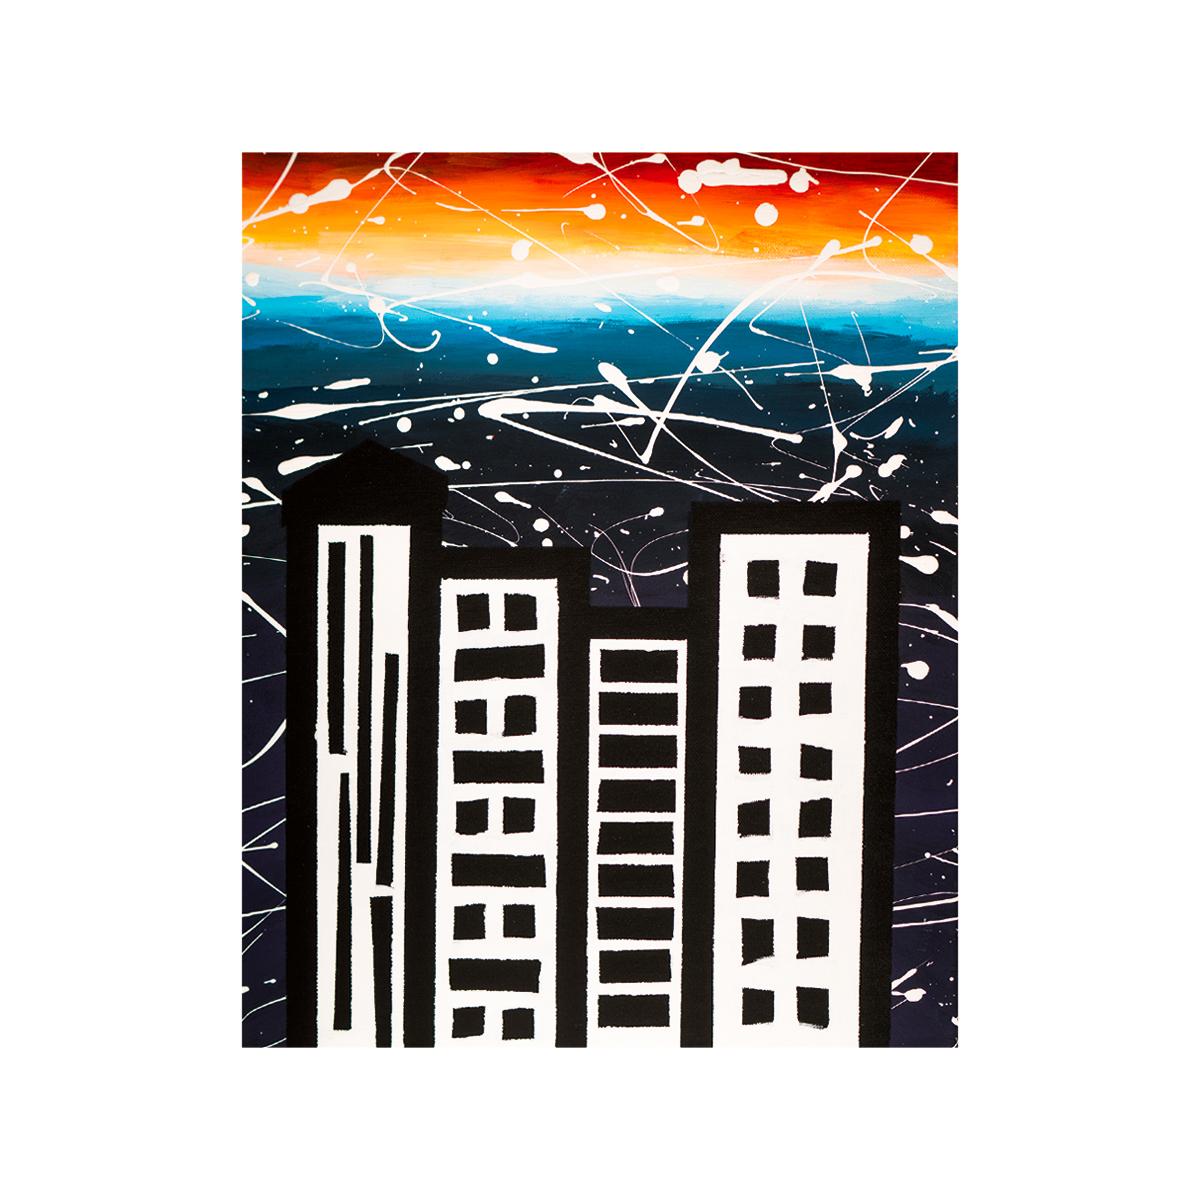 City Night Sunset  16x20 acrylic on canvas